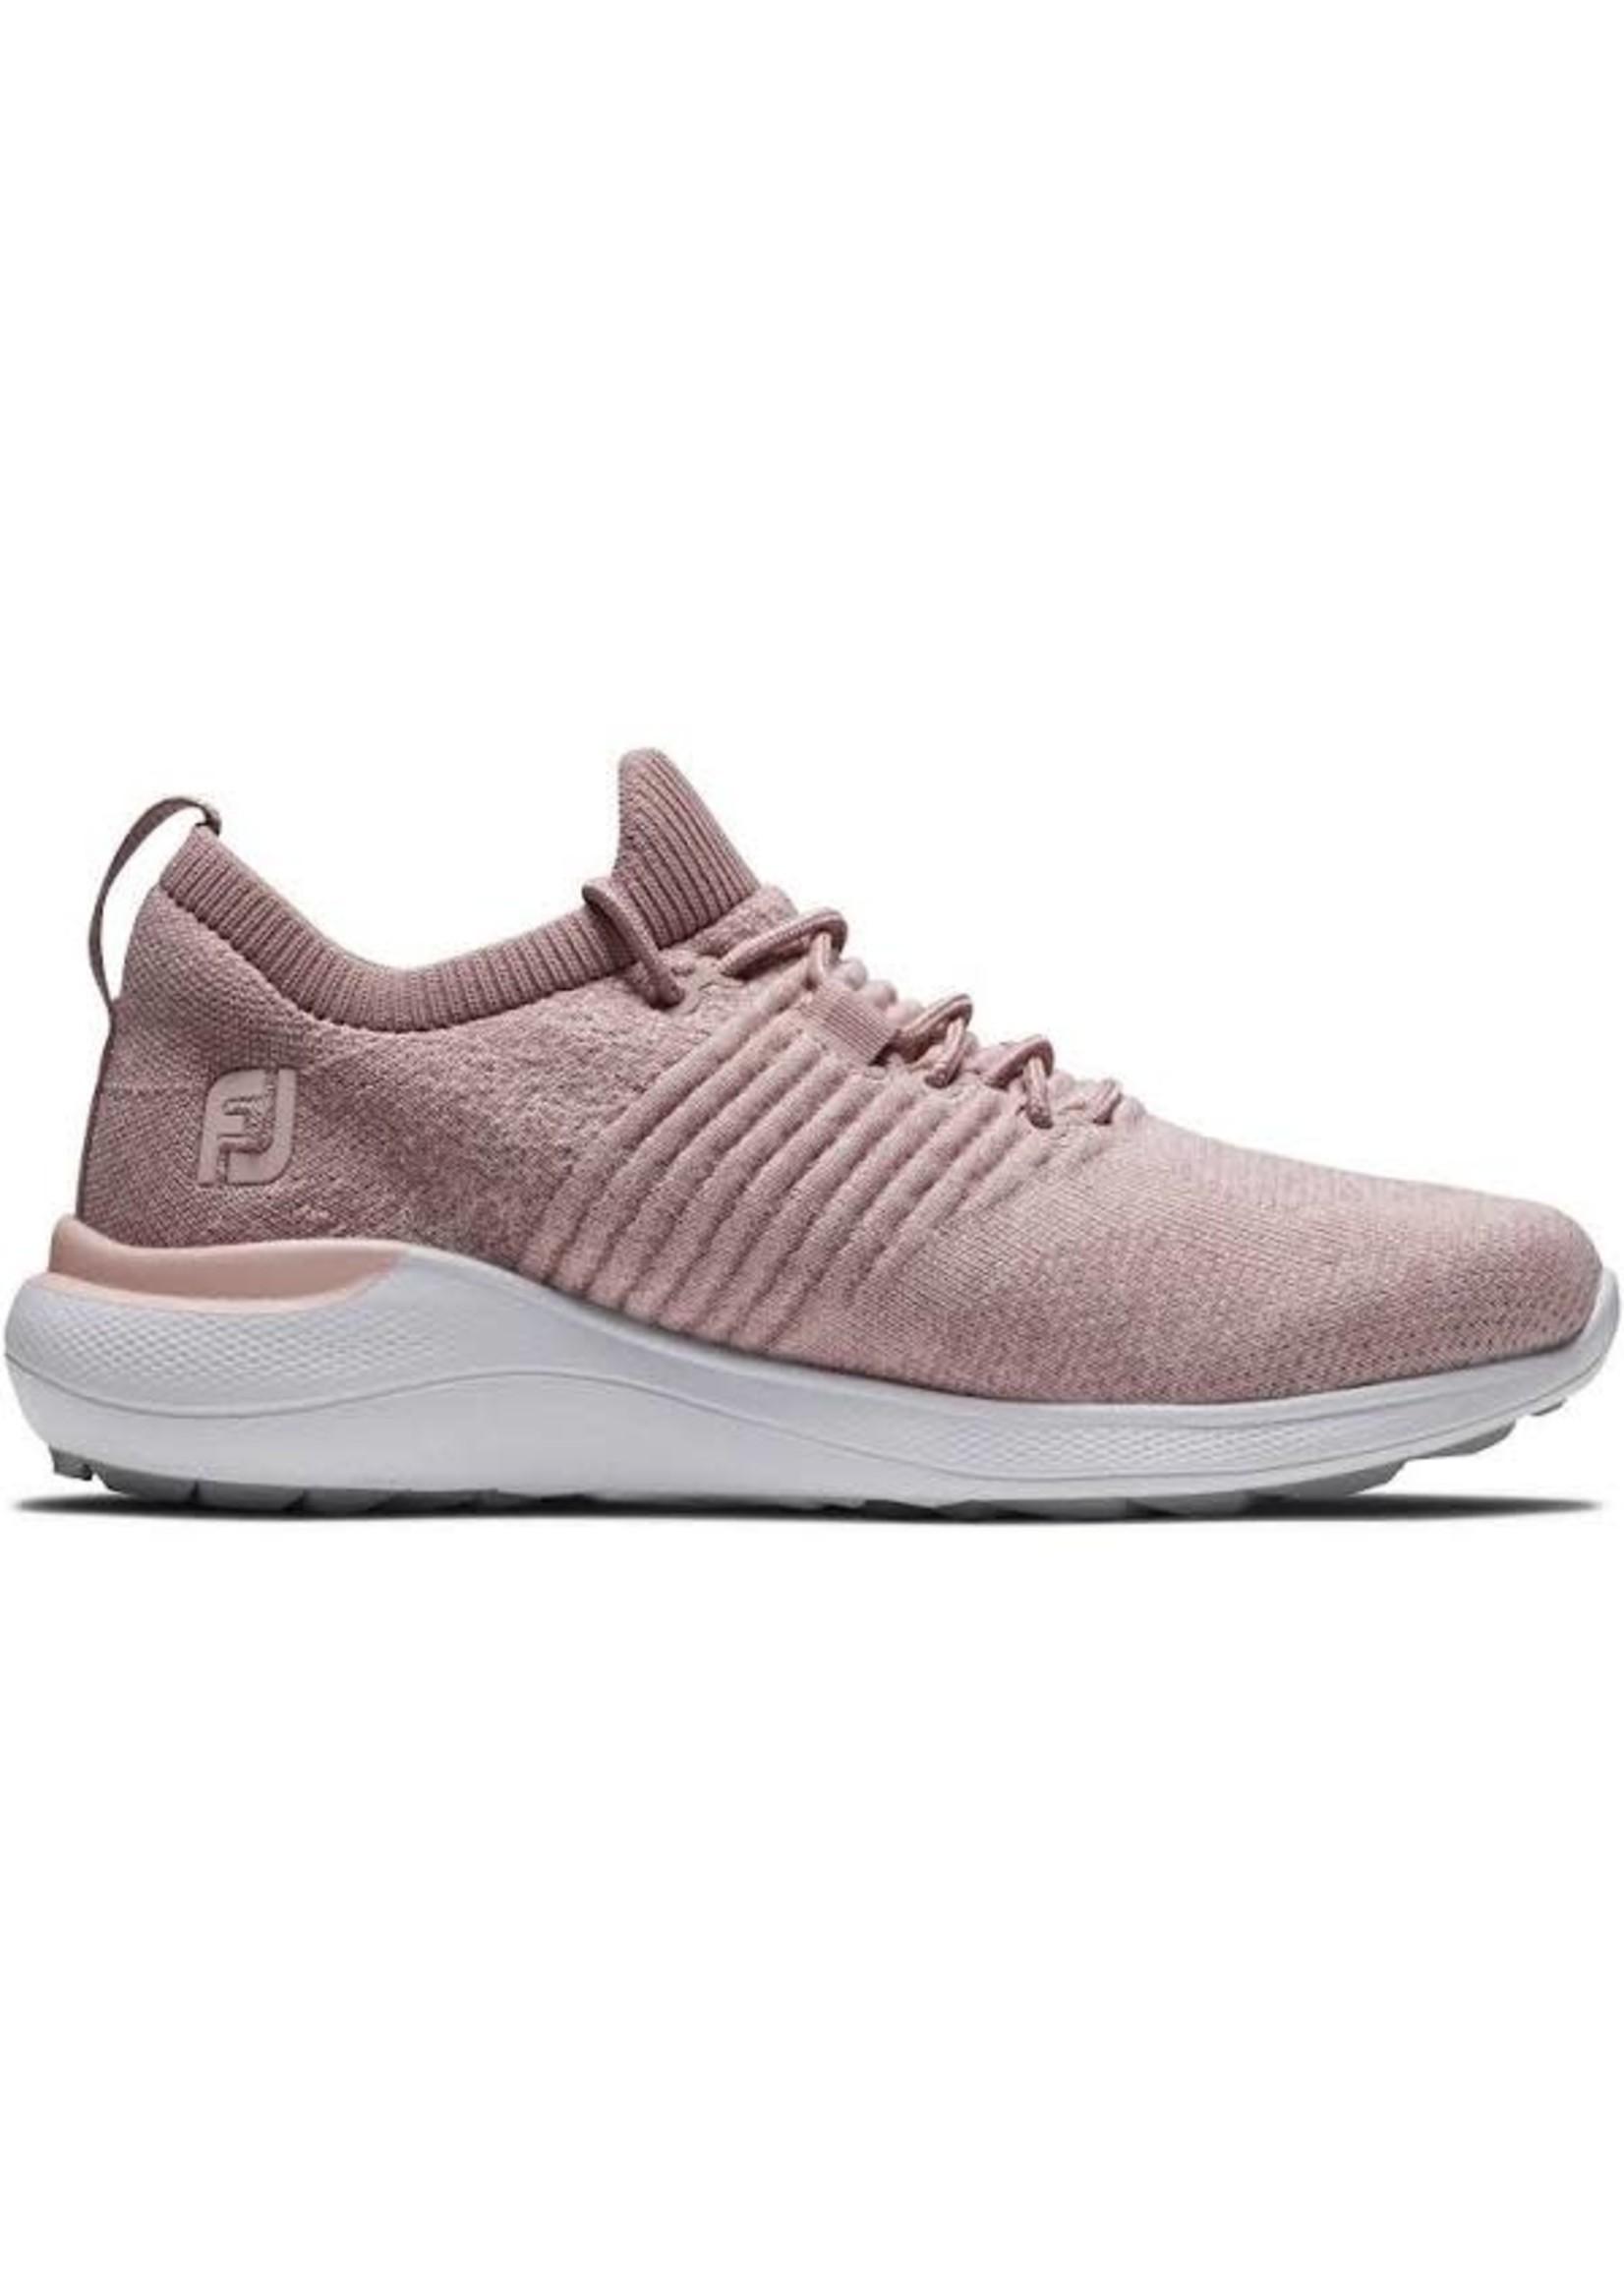 Footjoy Footjoy FJ Flex XP Ladies Golf Shoe, Pink